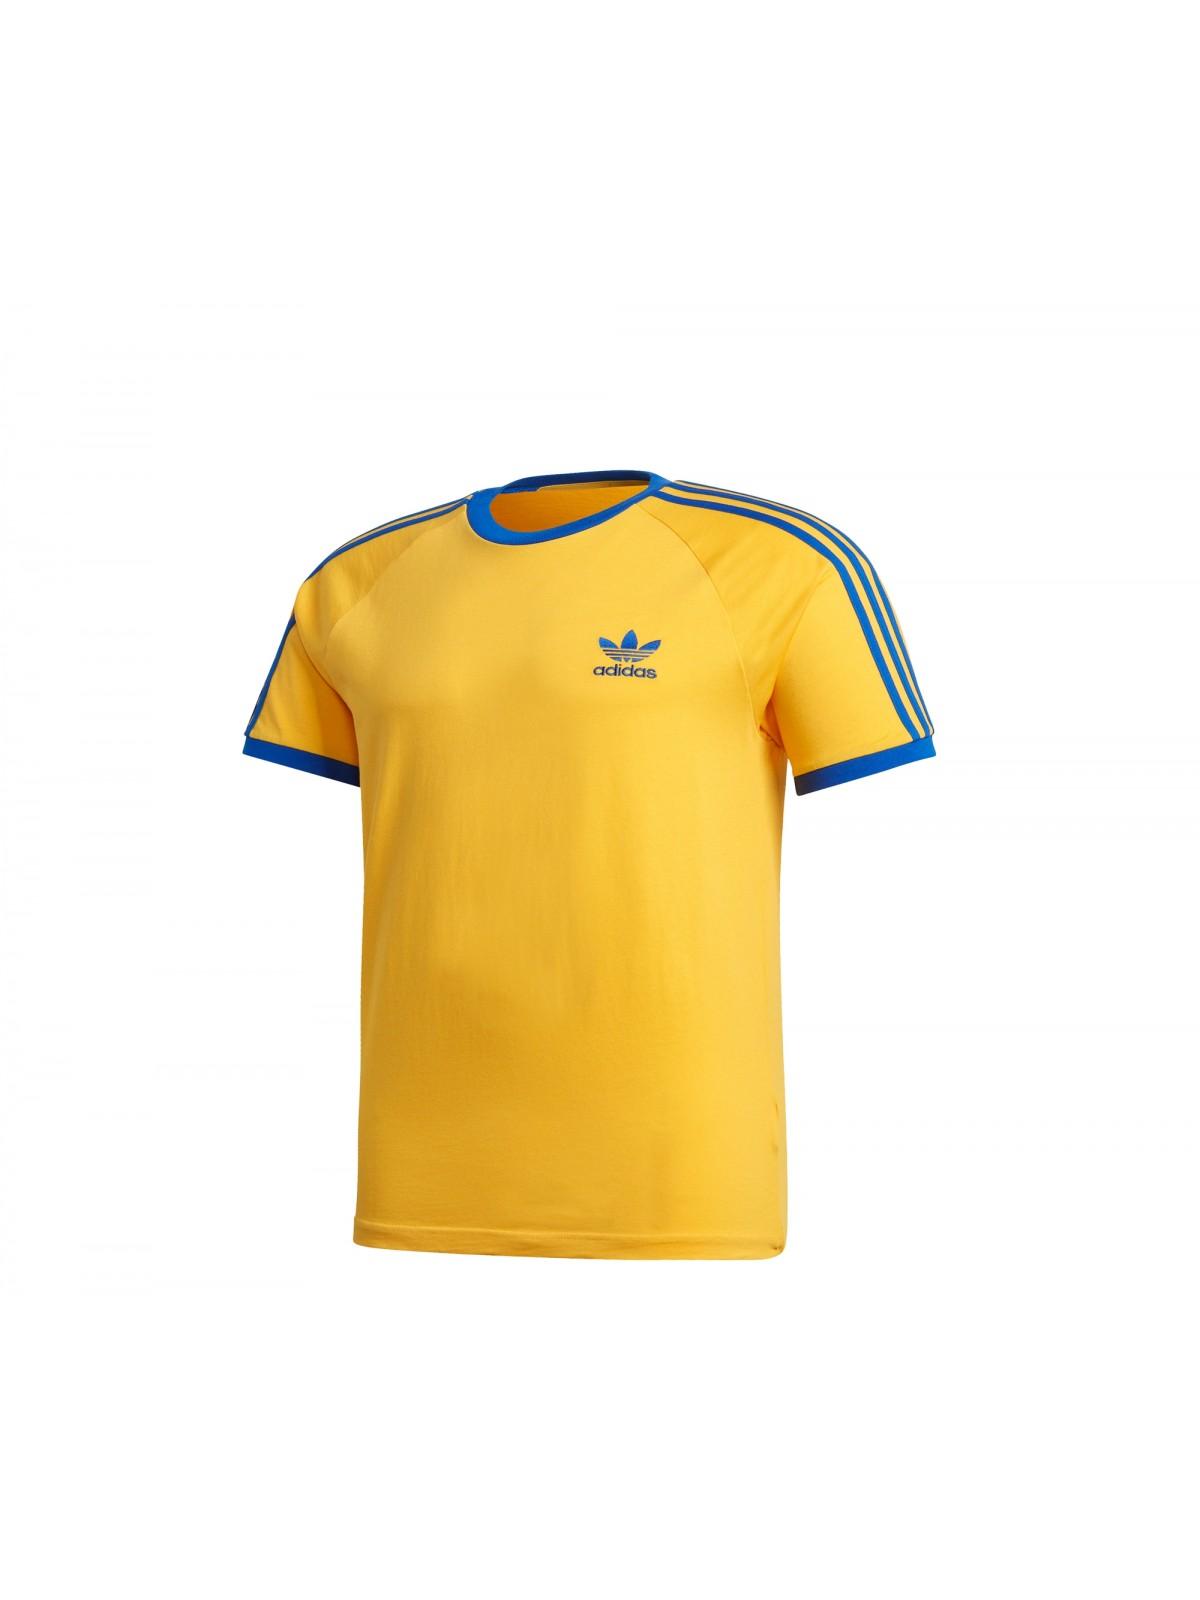 ADIDAS GE6233 Tee- Shirt gold